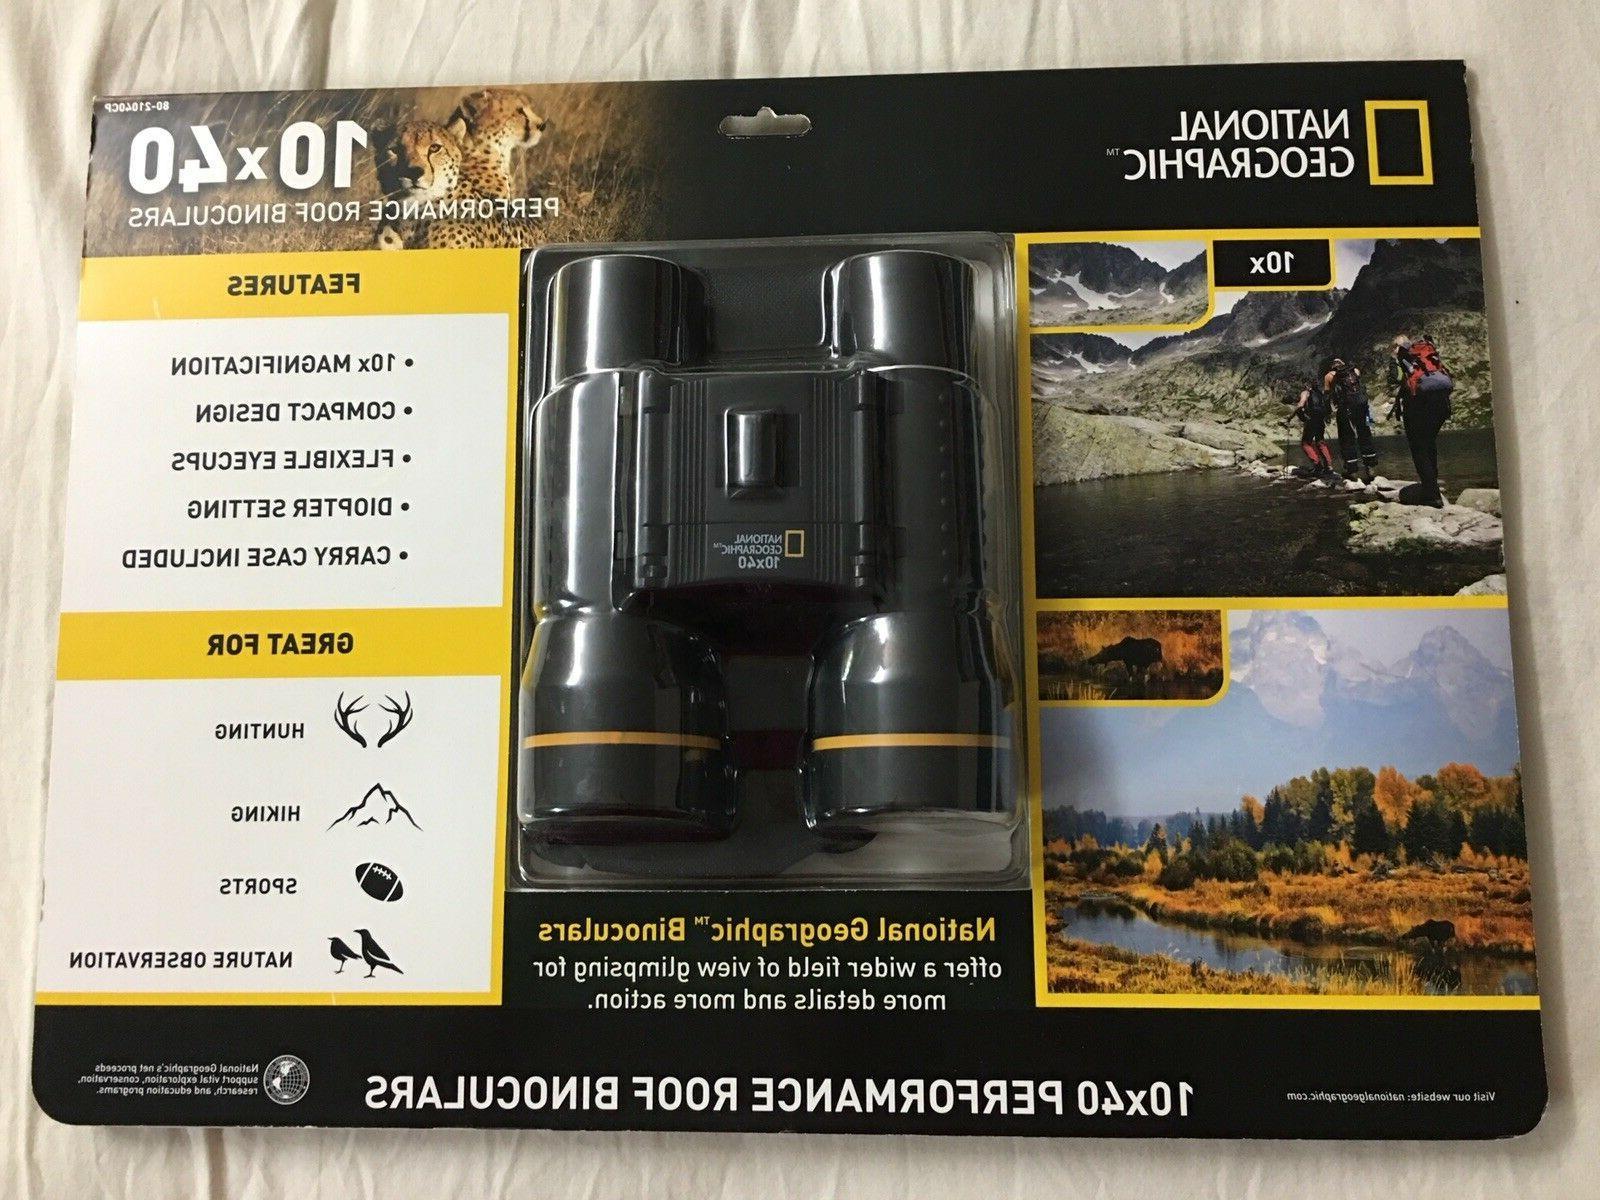 10x40 performance roof binoculars